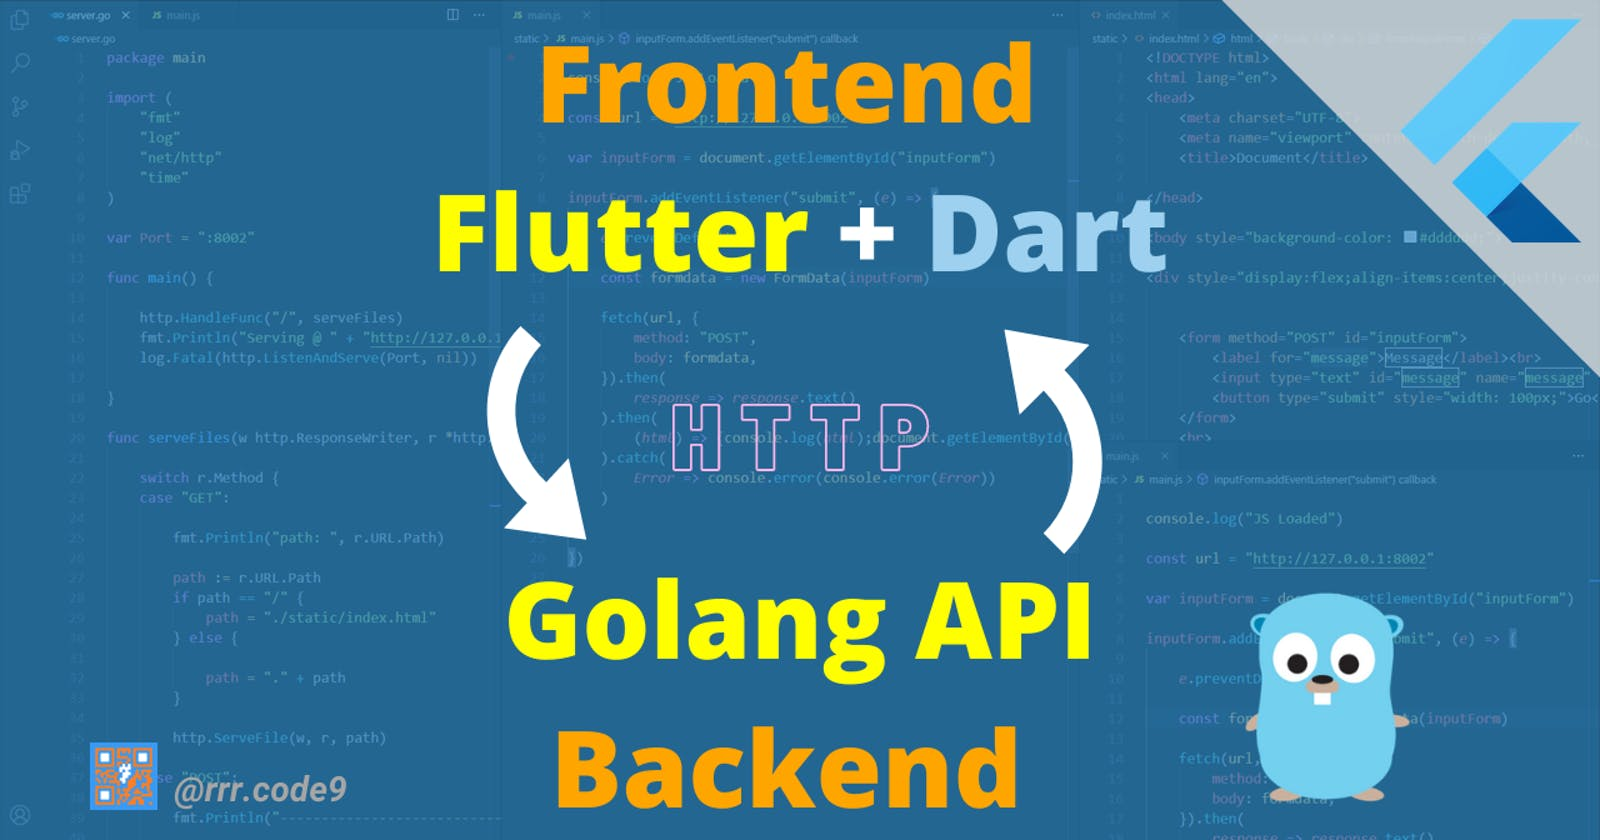 Flutter+Dart Frontend <-->Golang Backend API